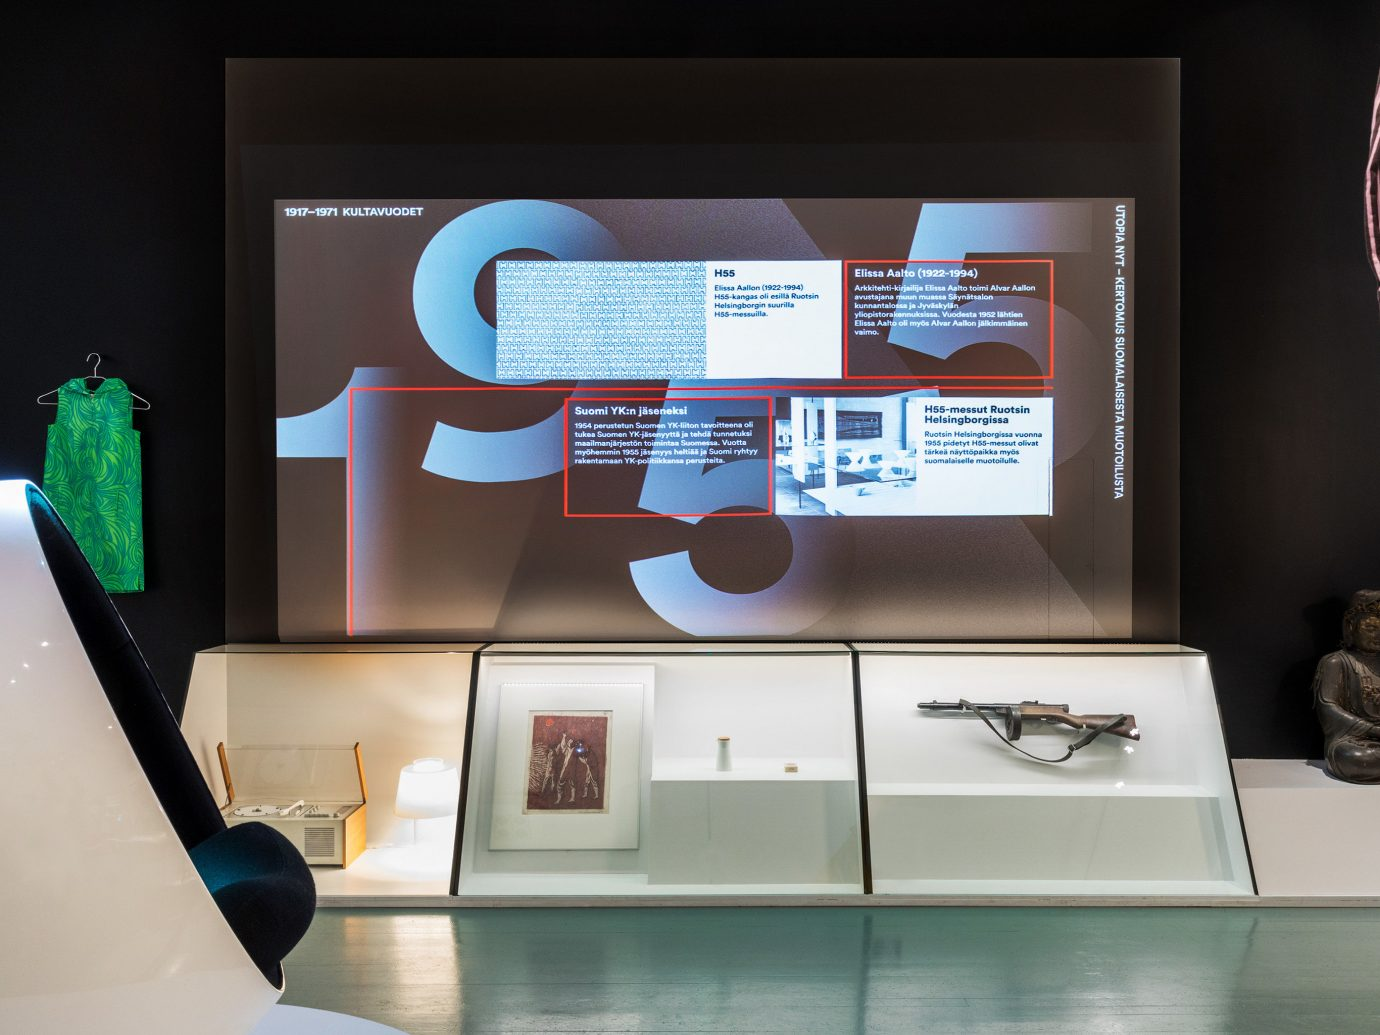 Finland Trip Ideas indoor product design Design furniture exhibition interior design technology multimedia display device